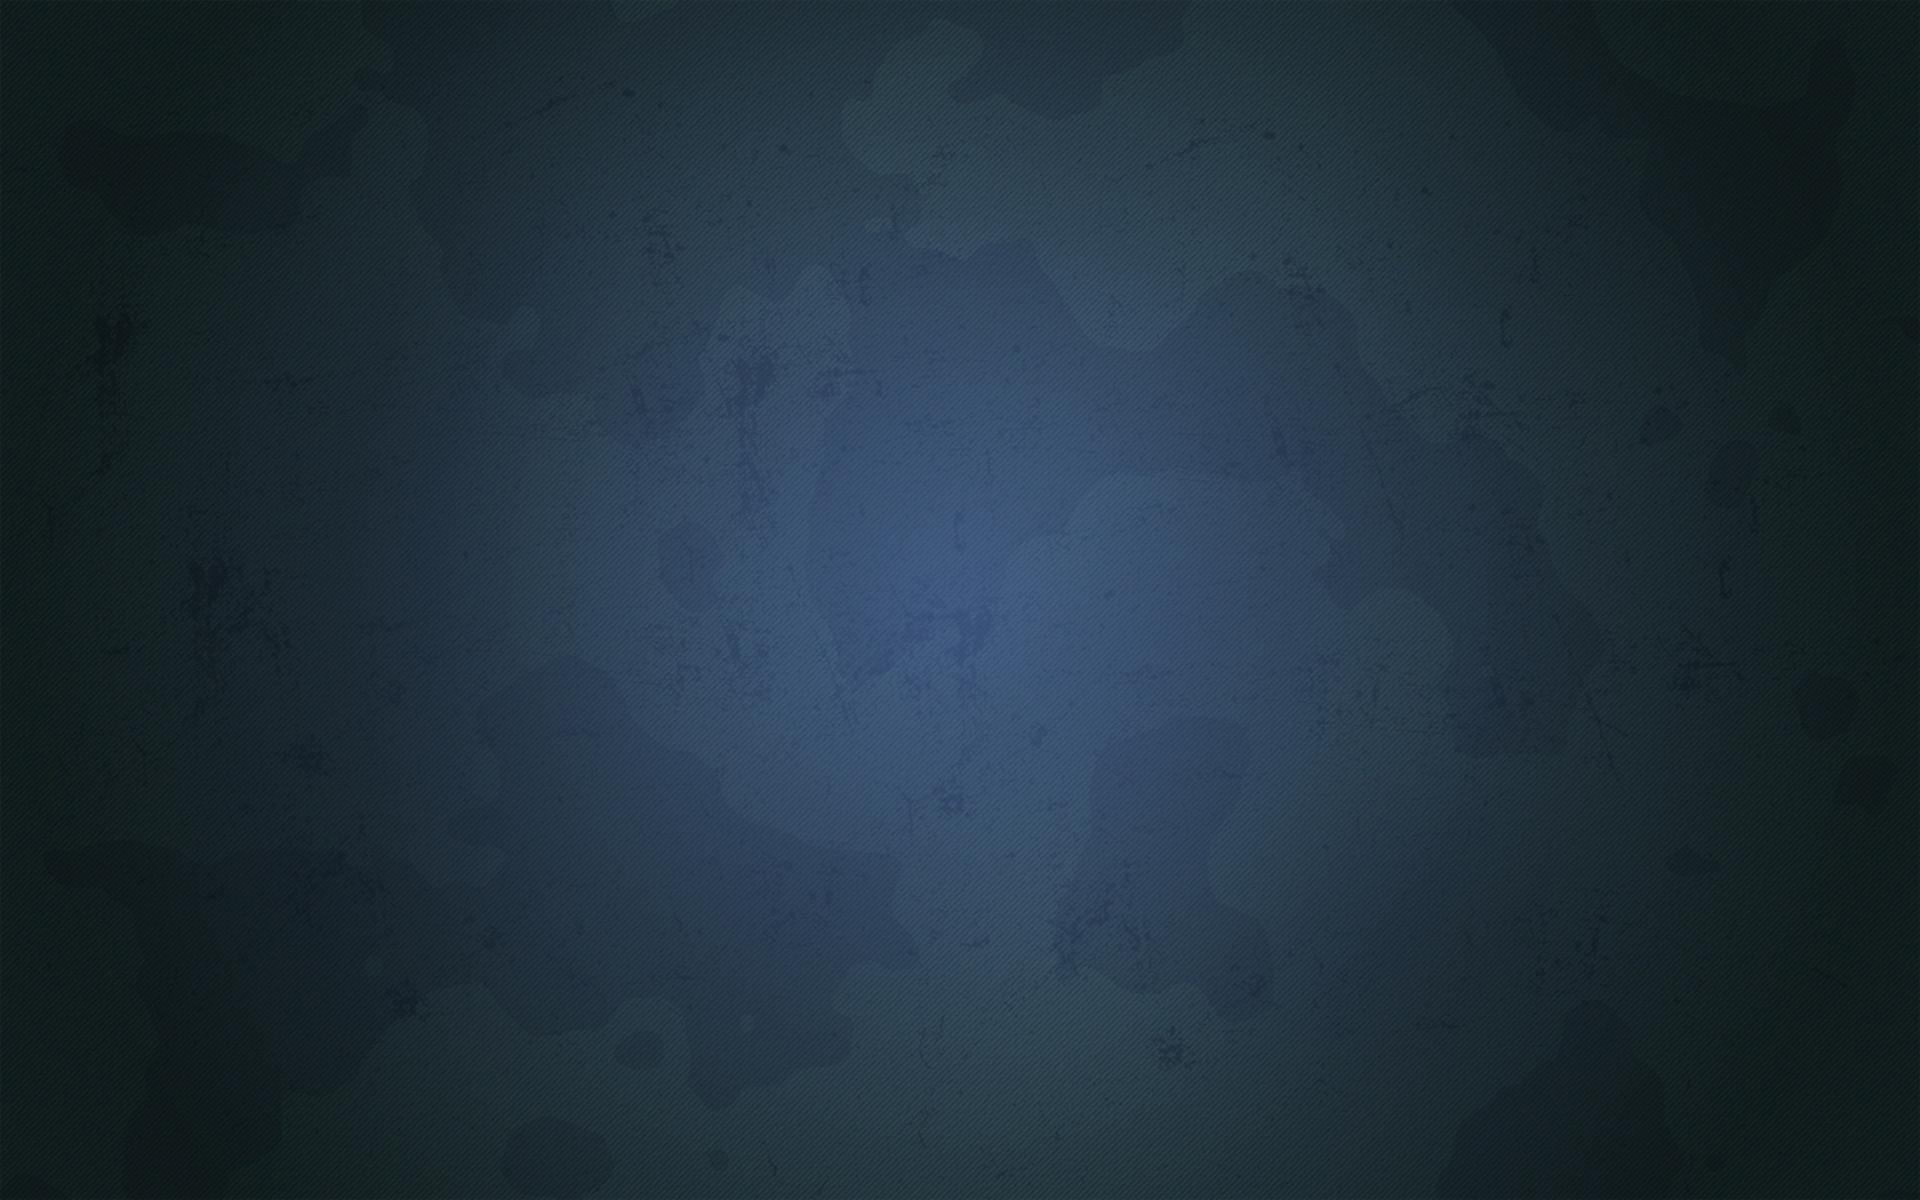 Dark Blue Wallpaper HD Wallpapers, Backgrounds, Images, Art Photos